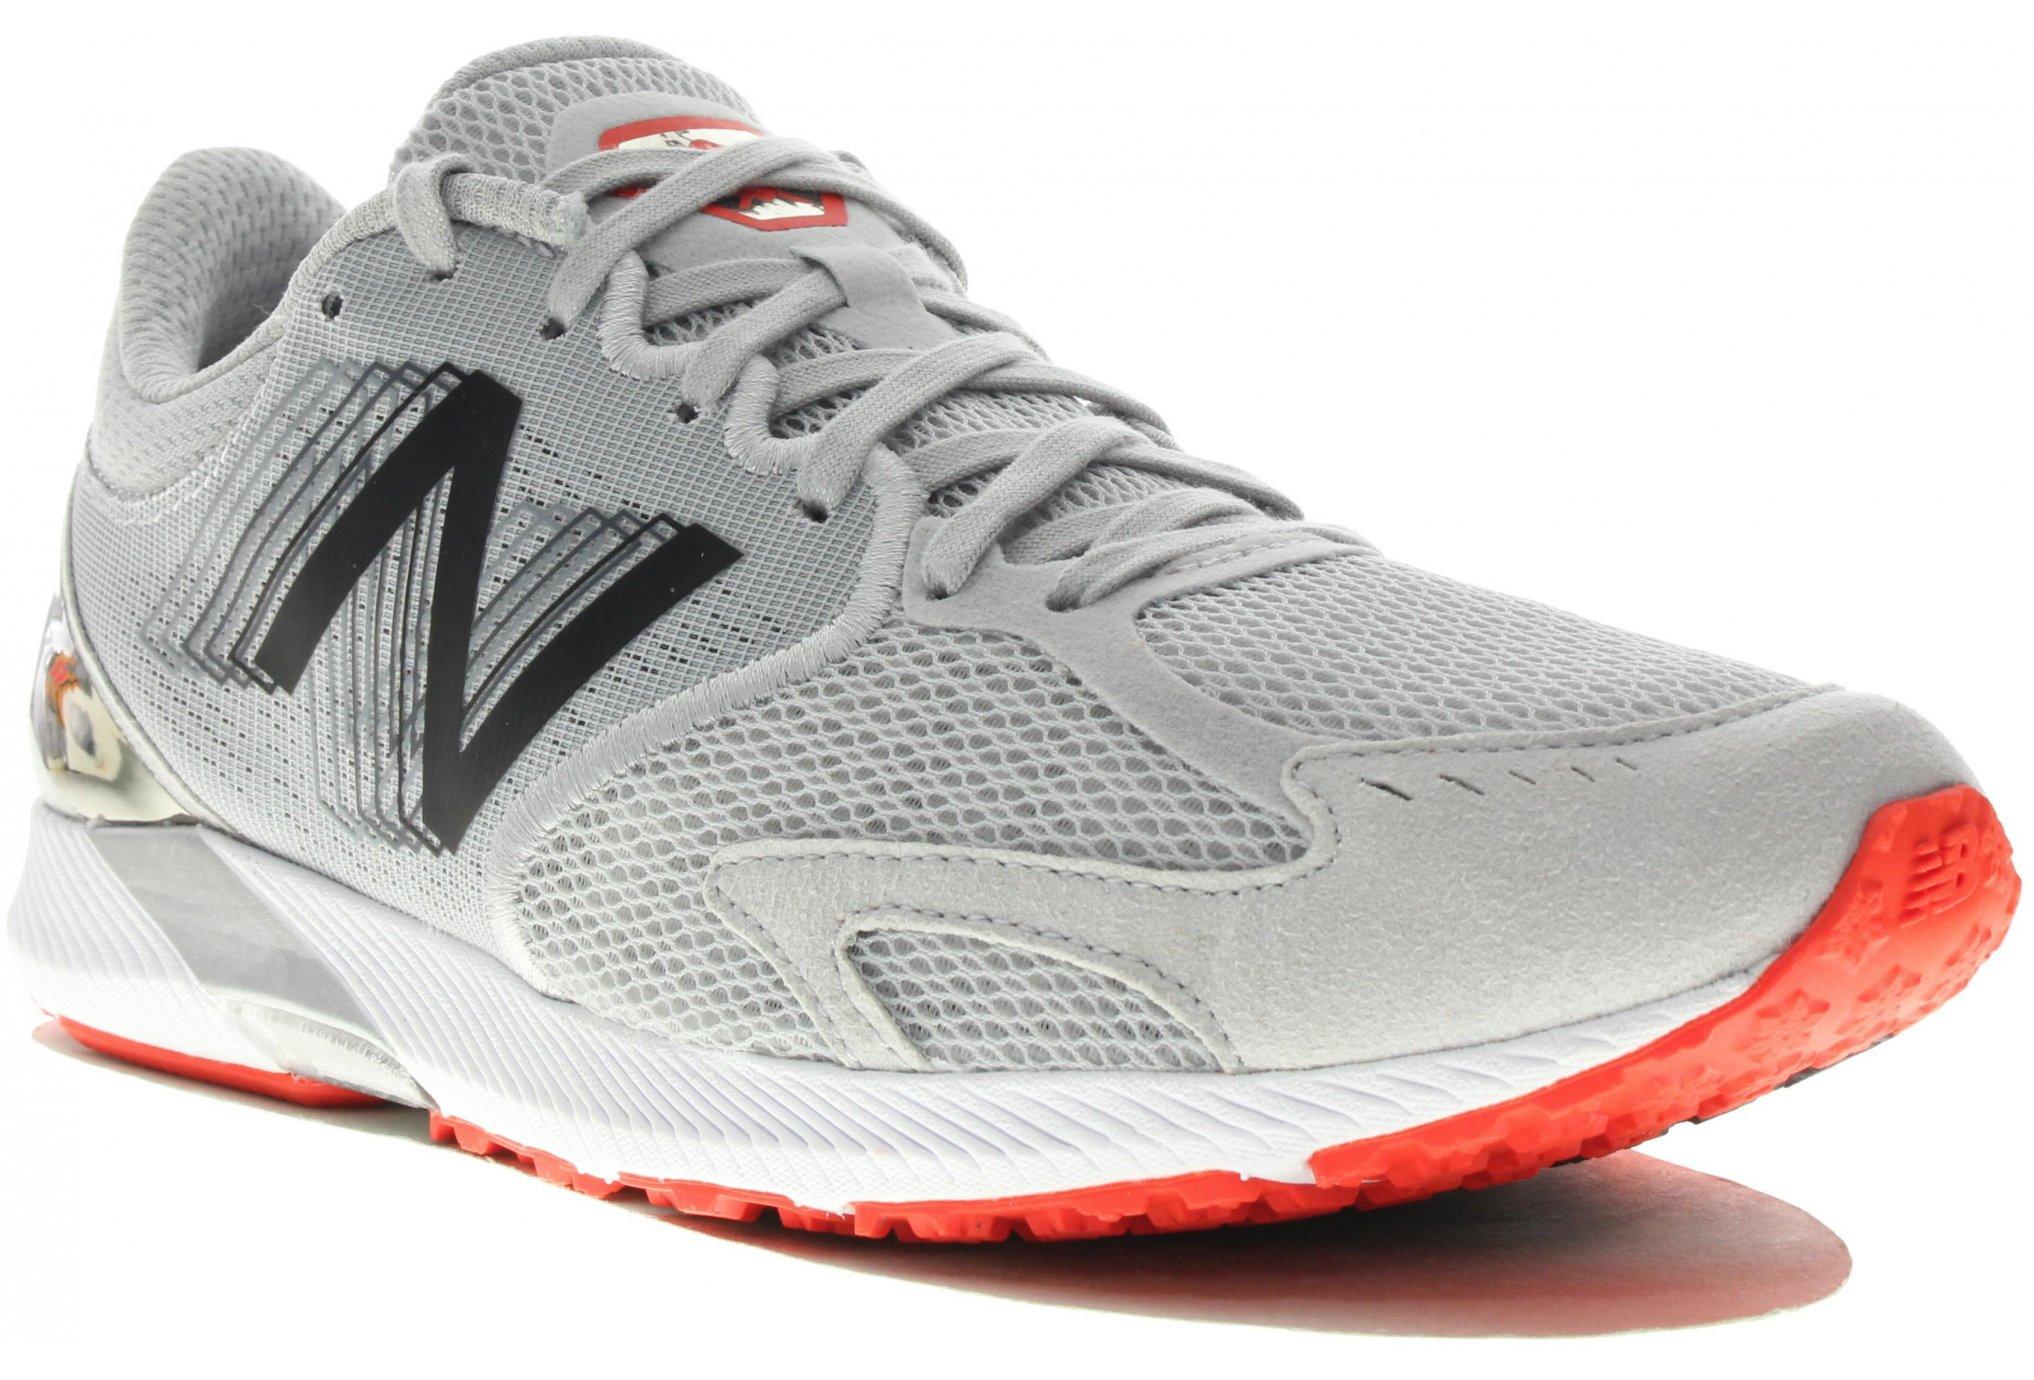 New Balance Hanzo R V3 Chaussures running femme